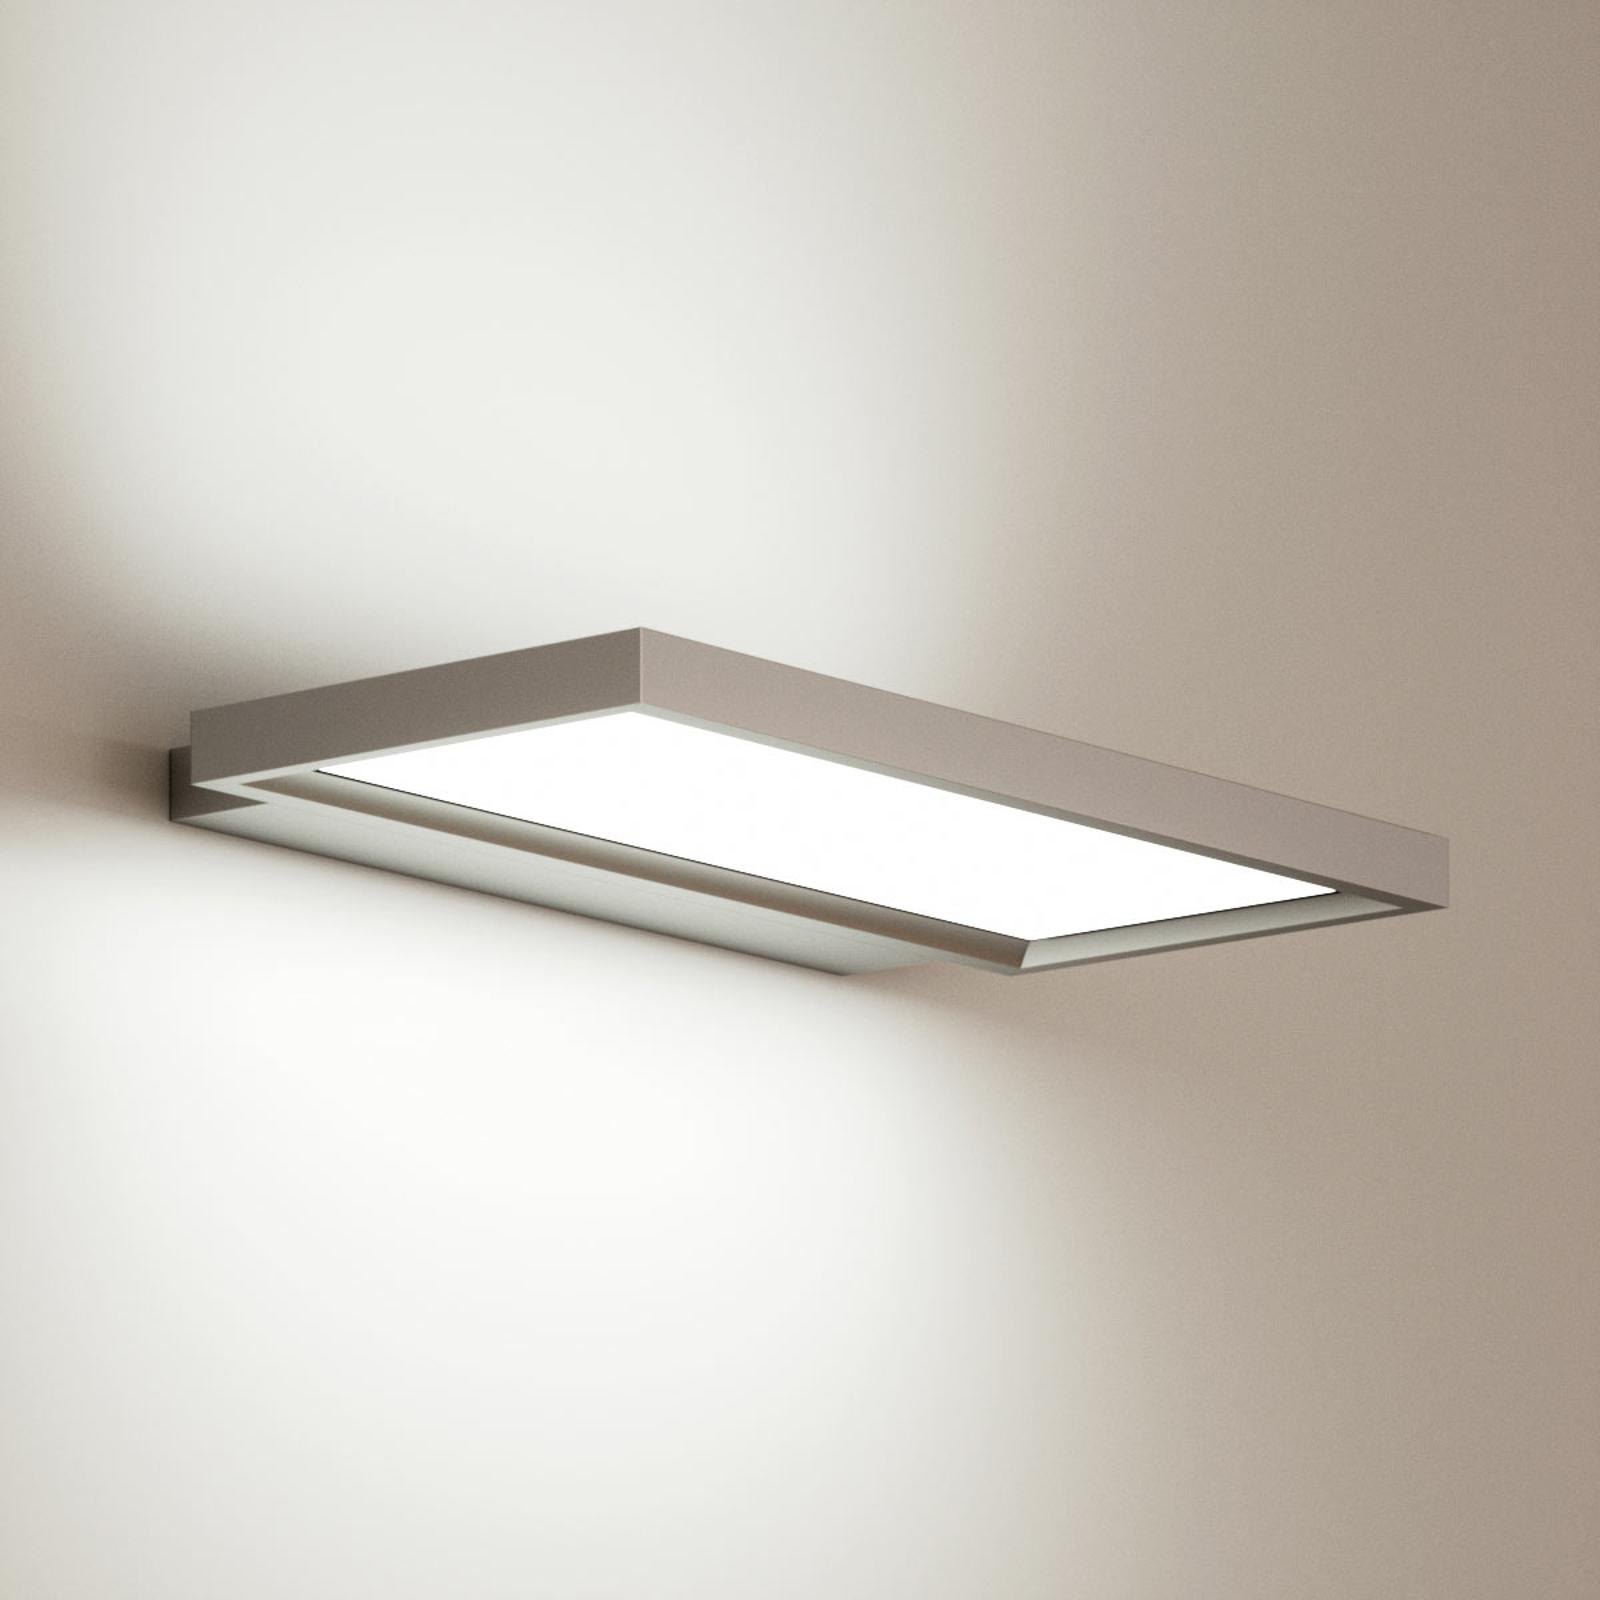 LED-vegglampe Rick til kontoret, universalhvit